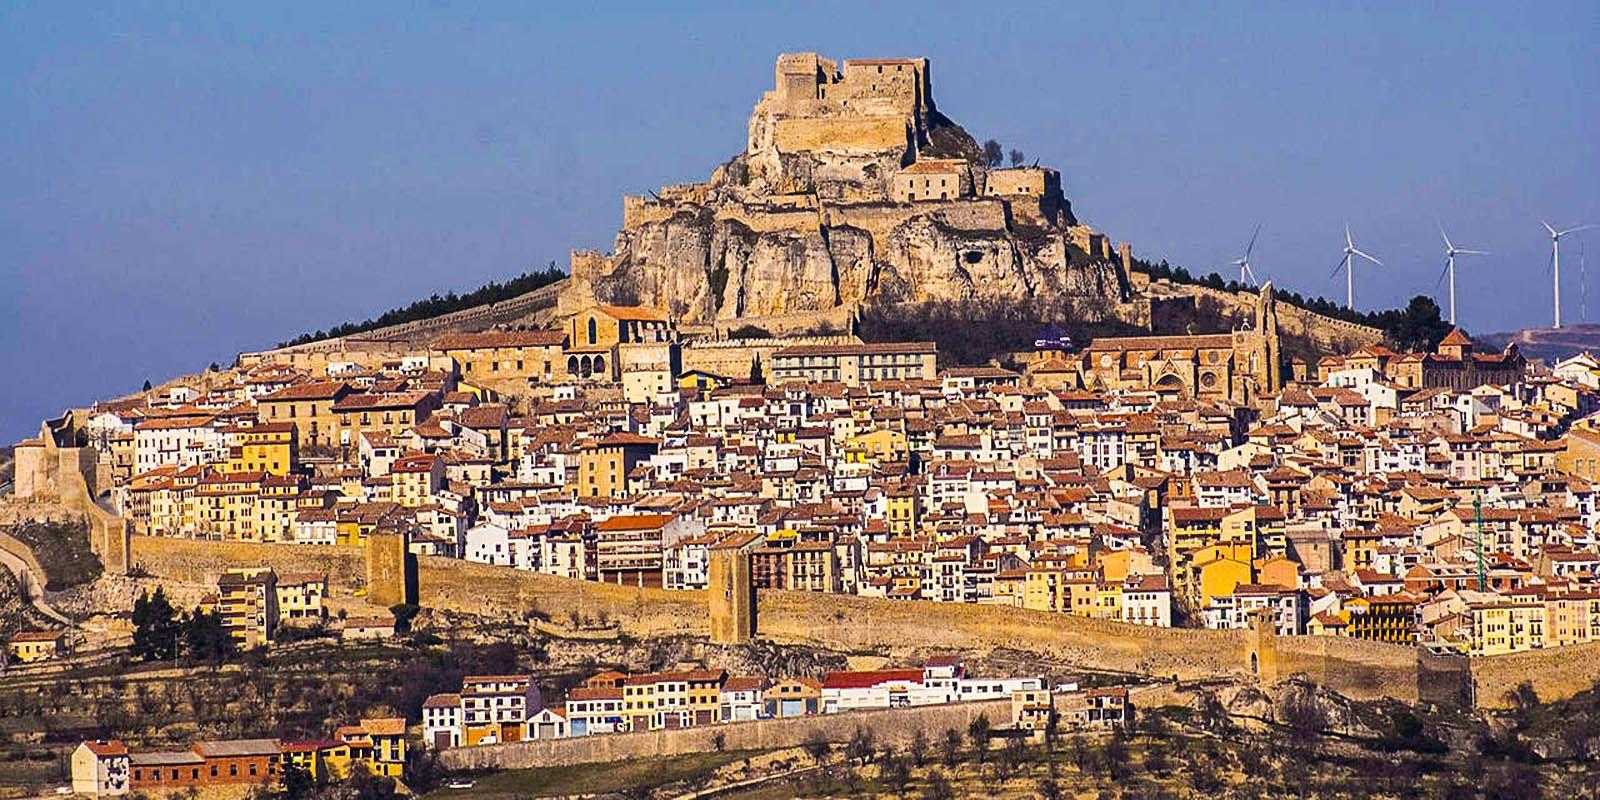 Camino De Castellon Castellon De La Plana Morella Fuentes De Ebro